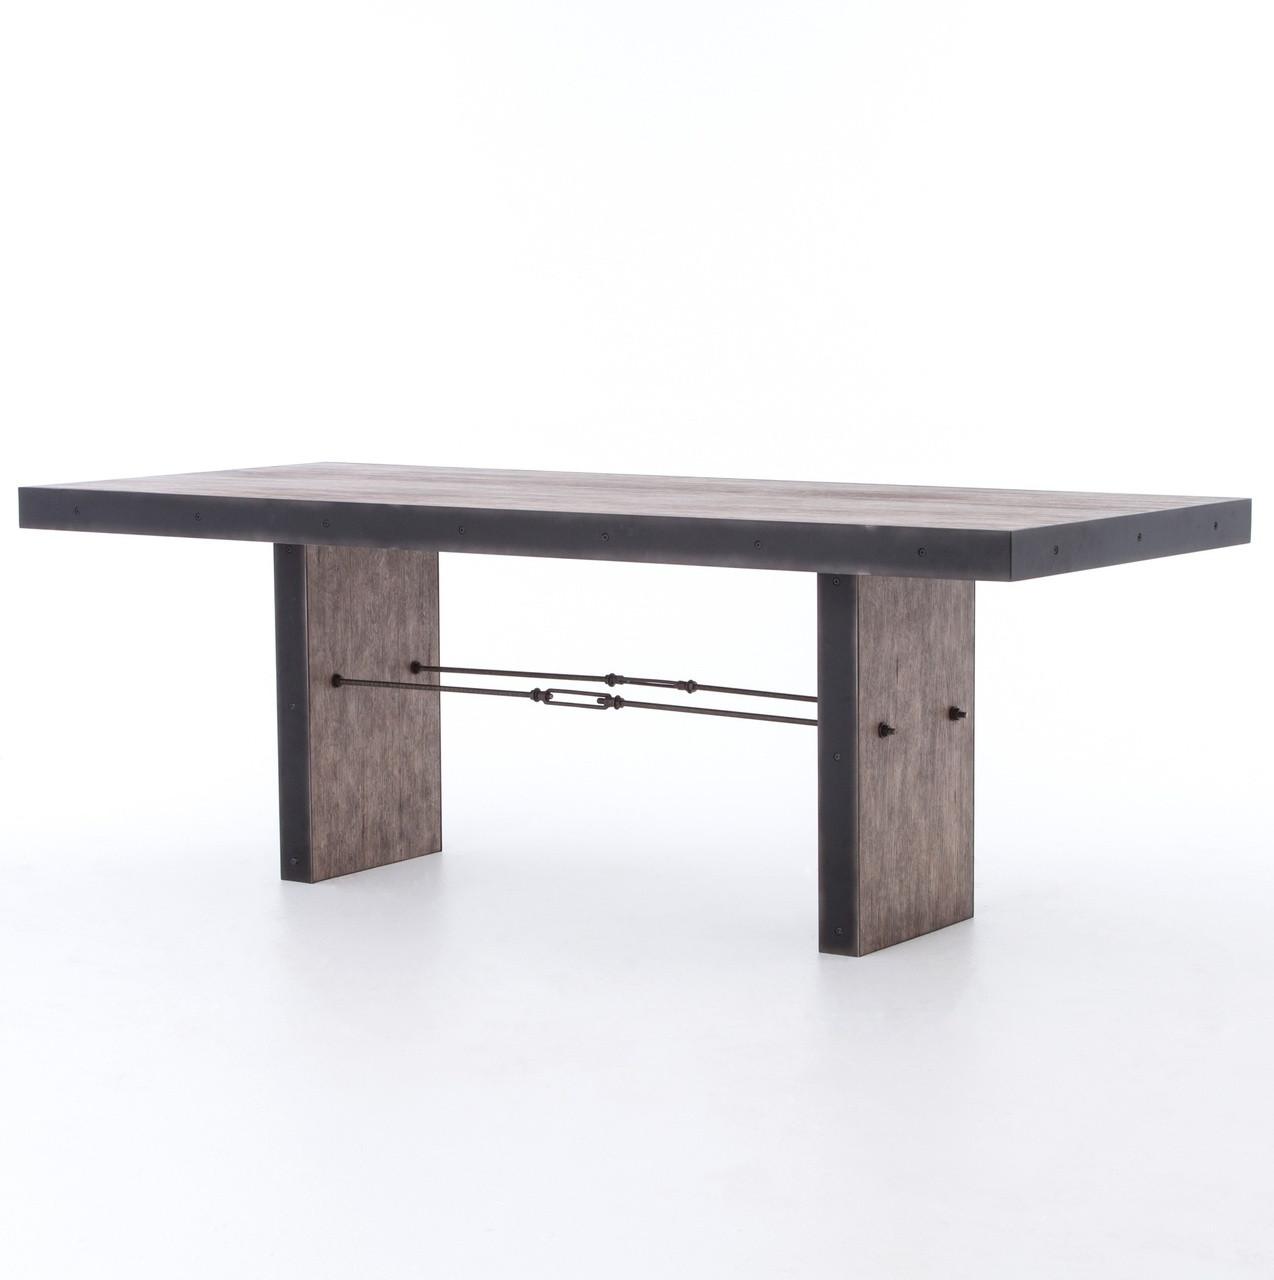 Gerard Driftwood Oak + Iron Dining Room Table - Gerard Driftwood Oak + Iron Dining Room Table Zin Home